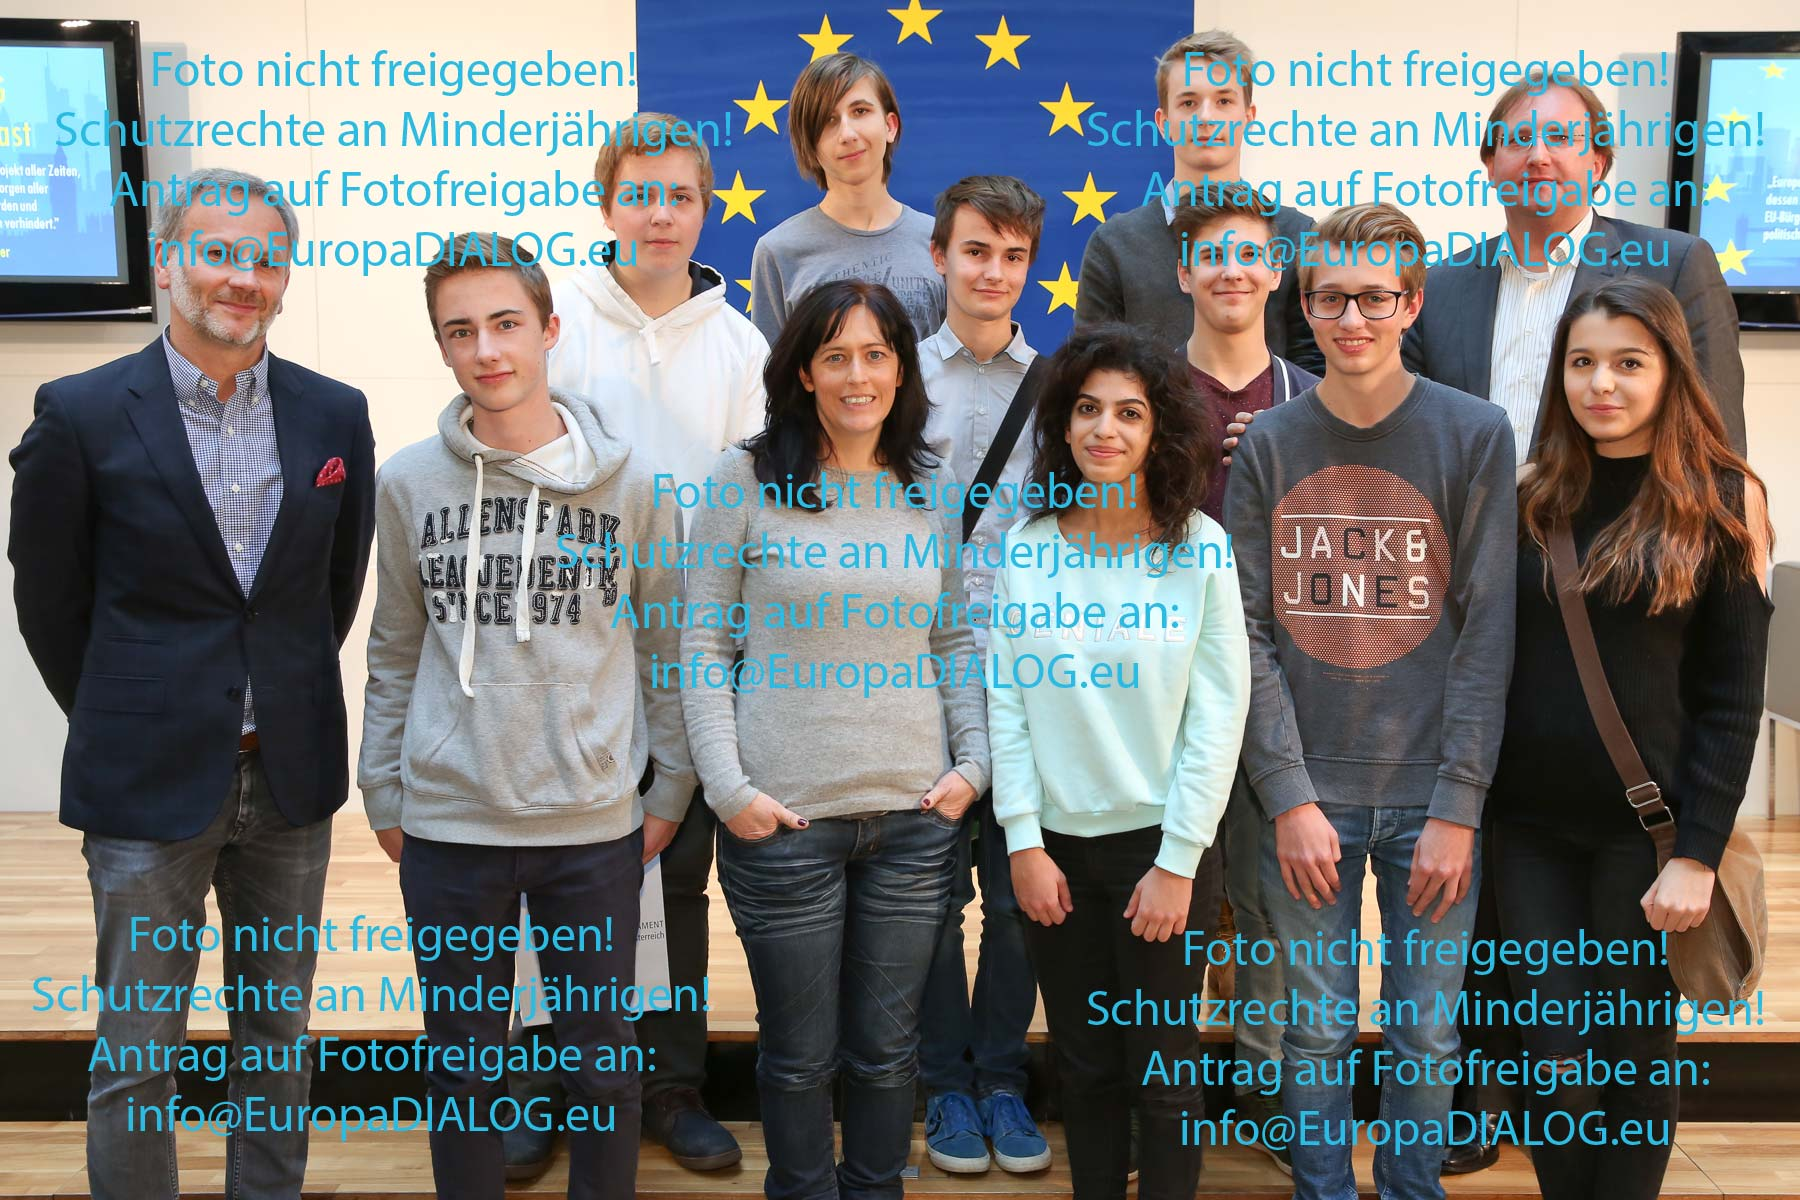 europadialog_bettina-prendergast_s_e07_rg-lambach_091904_-katharina-schiffl__